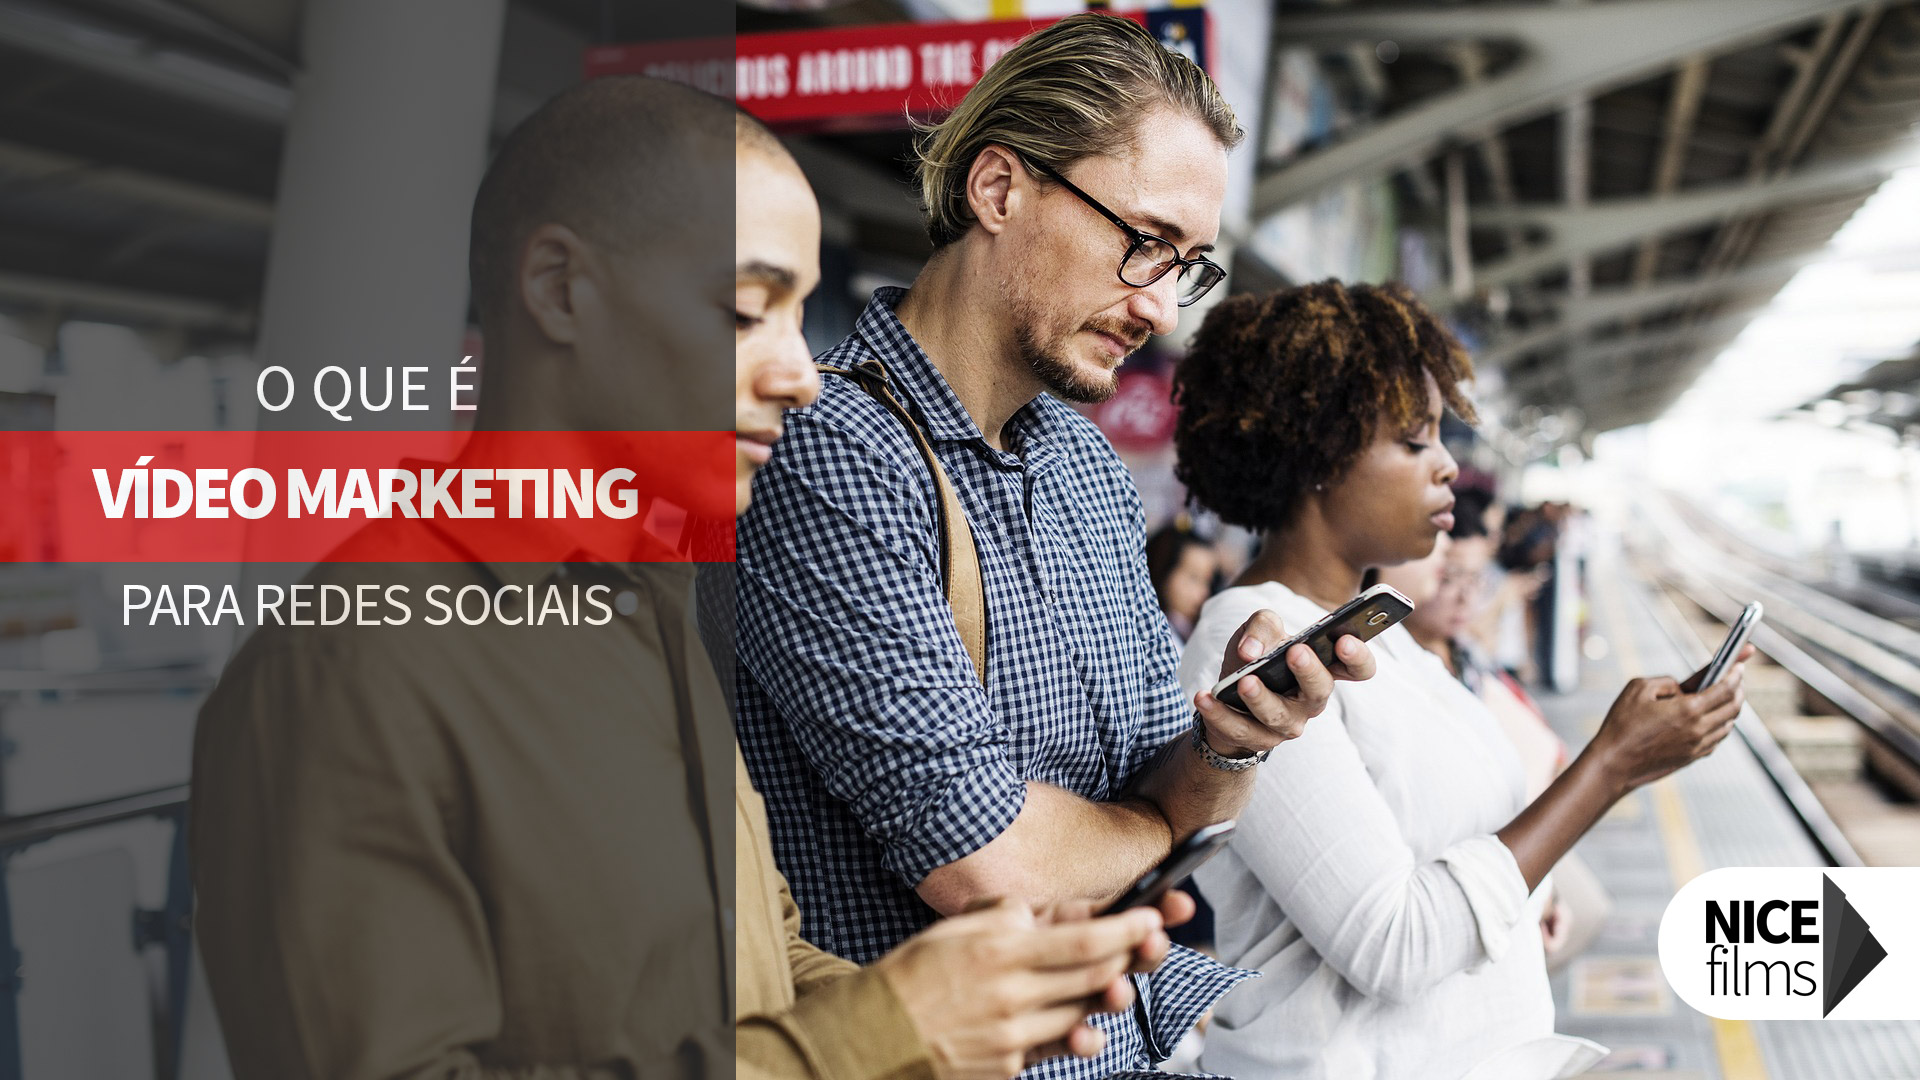 Vídeo Marketing para Redes Sociais